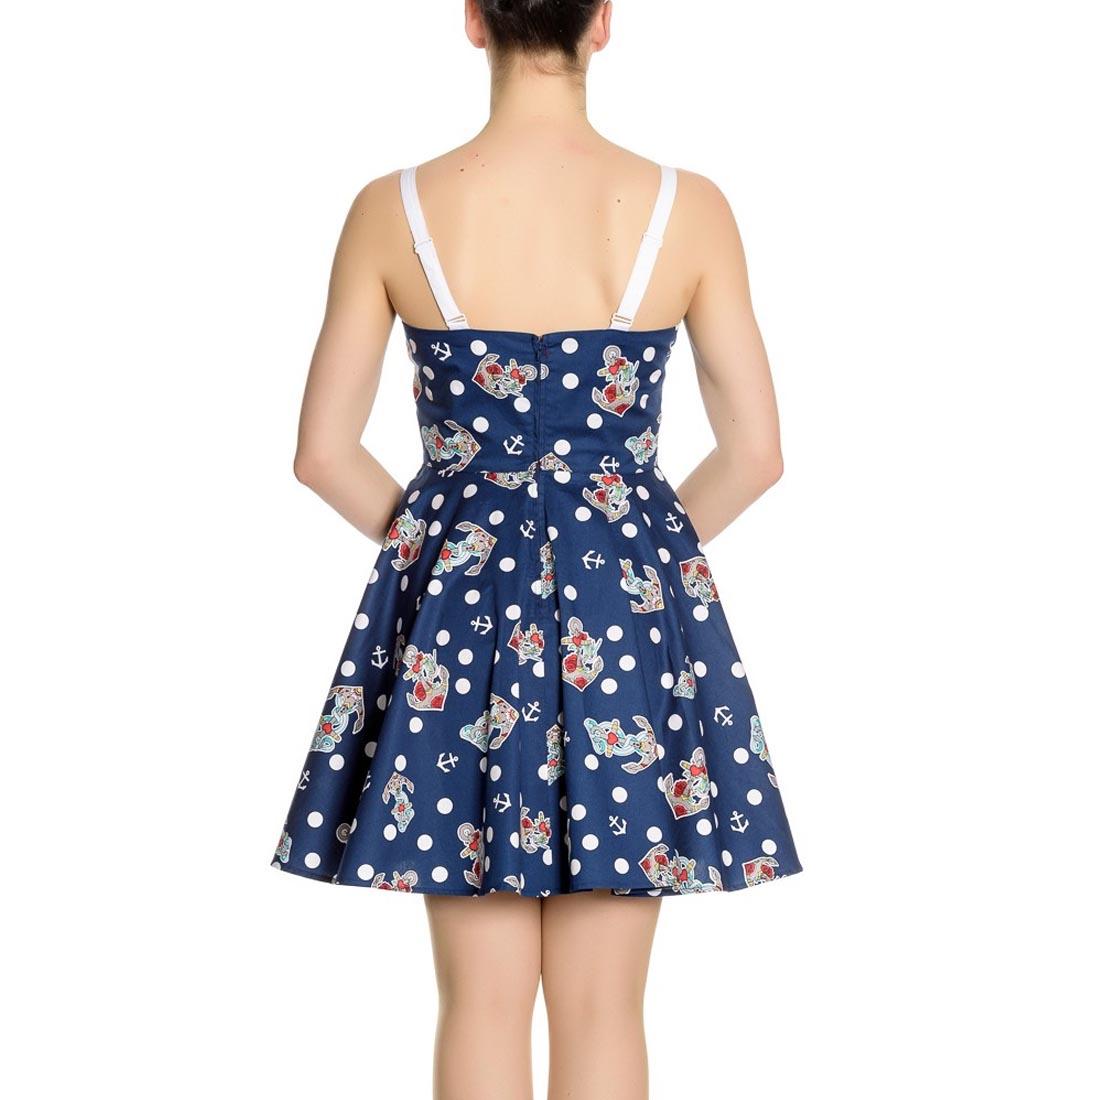 Hell-Bunny-Navy-Blue-50s-Nautical-Mini-Dress-OCEANA-Polka-Dot-All-Sizes thumbnail 13